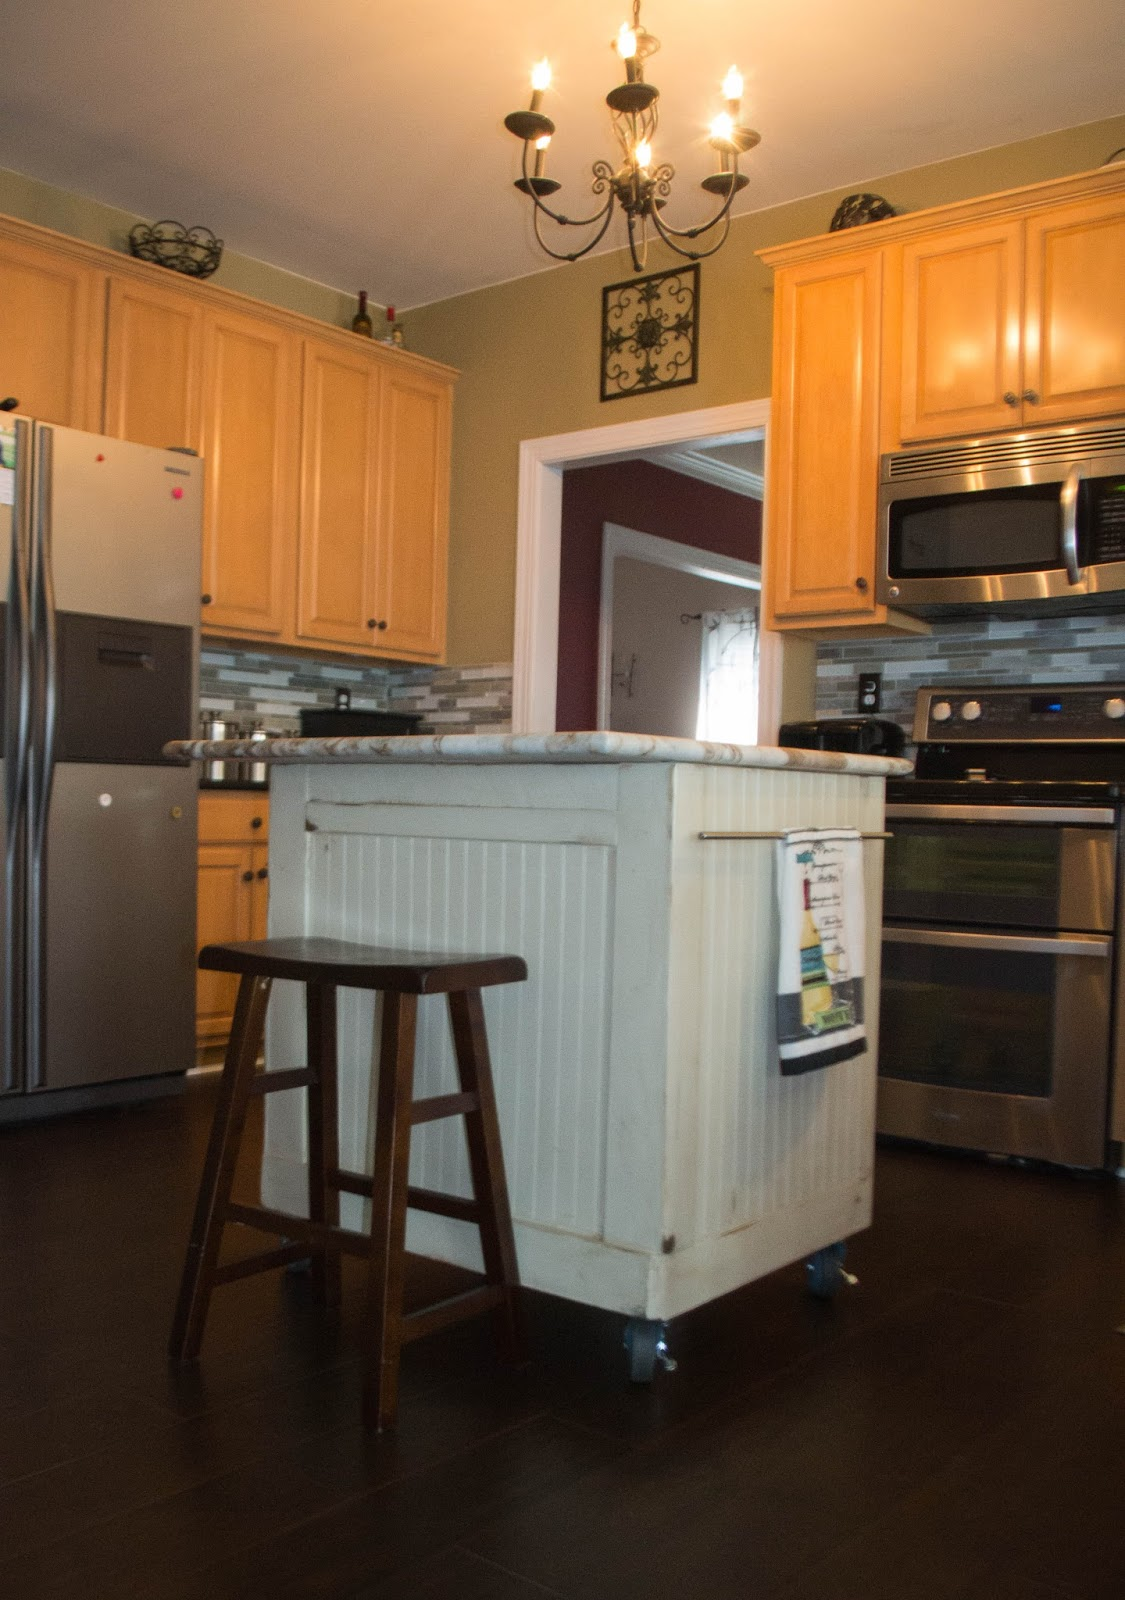 Kitchen Redo Down To Earth Style Nosey Neighbor Kitchen Redo 2